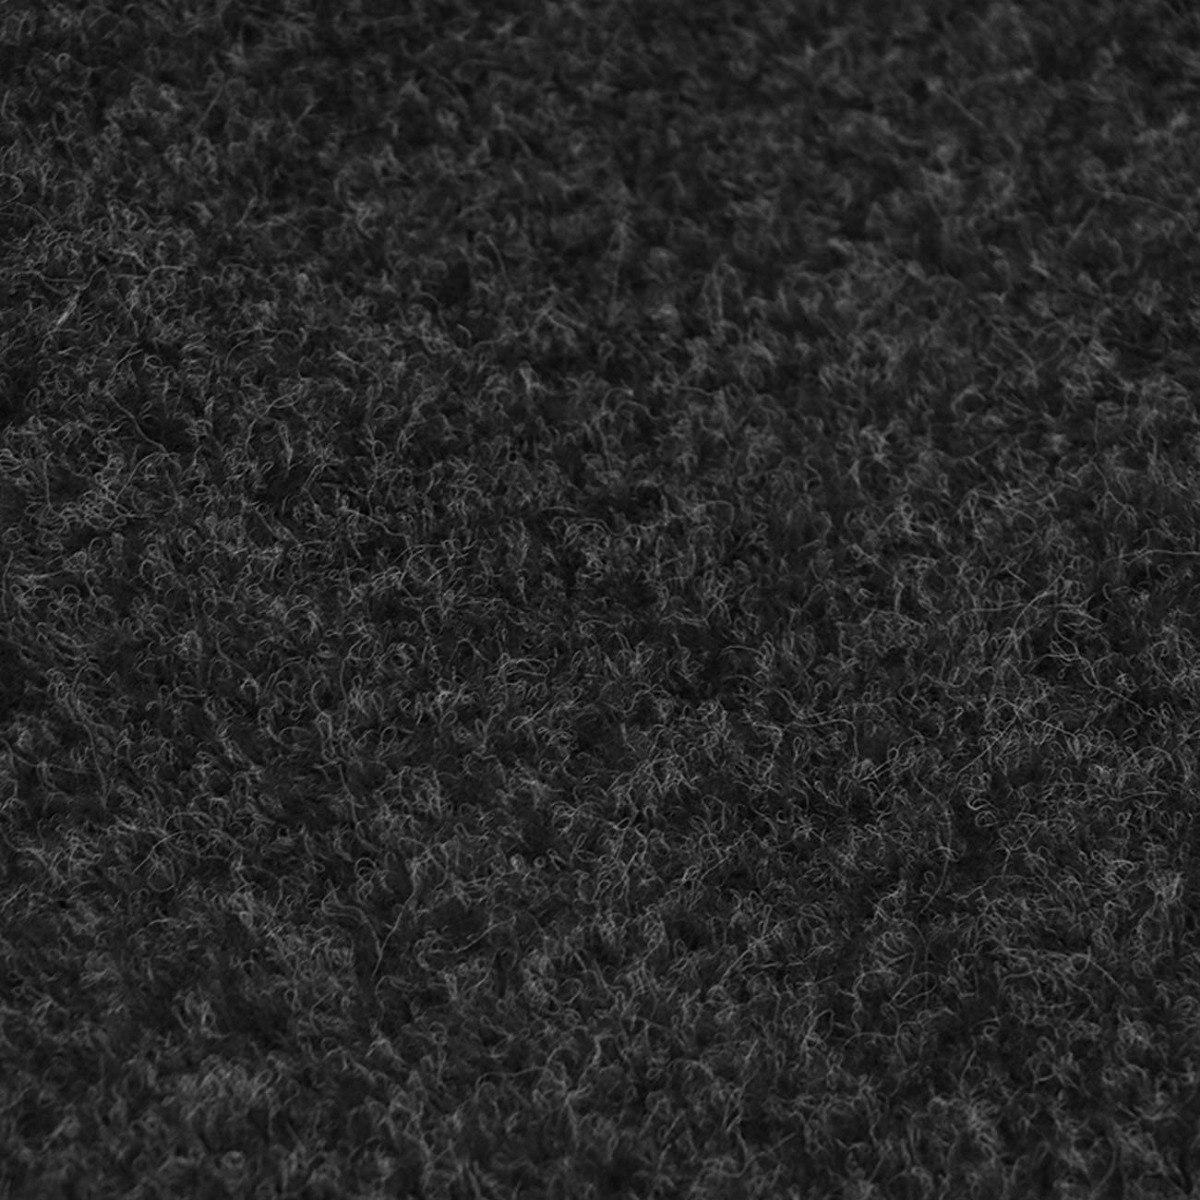 tapete tucson porta mala 2004 a 2018 carpete grafite bordado. Carregando  zoom. 40ff095469